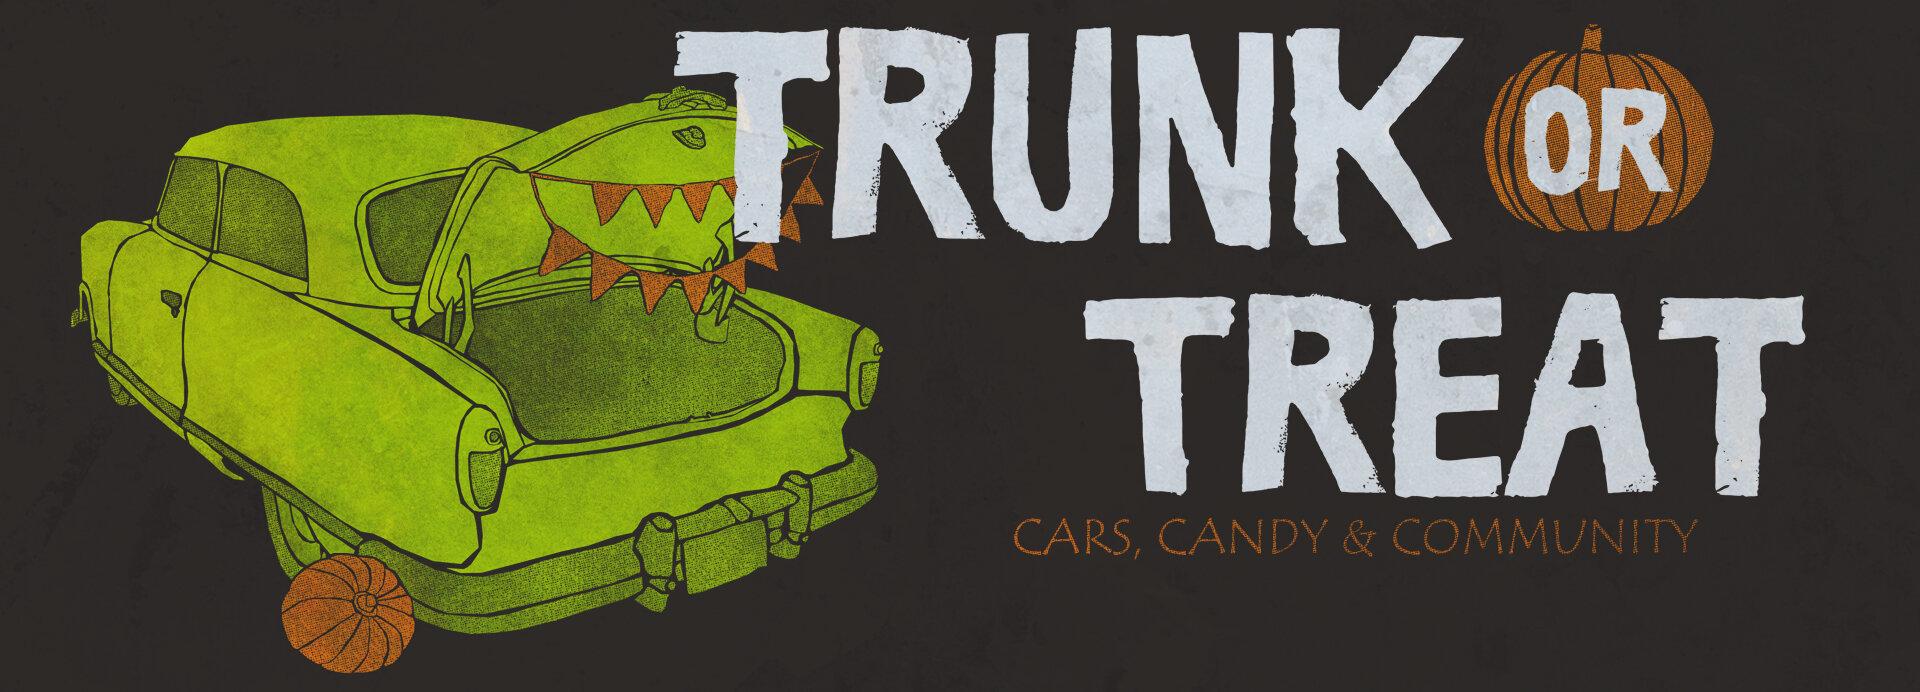 trunk_or_treat_2019_banner.jpg